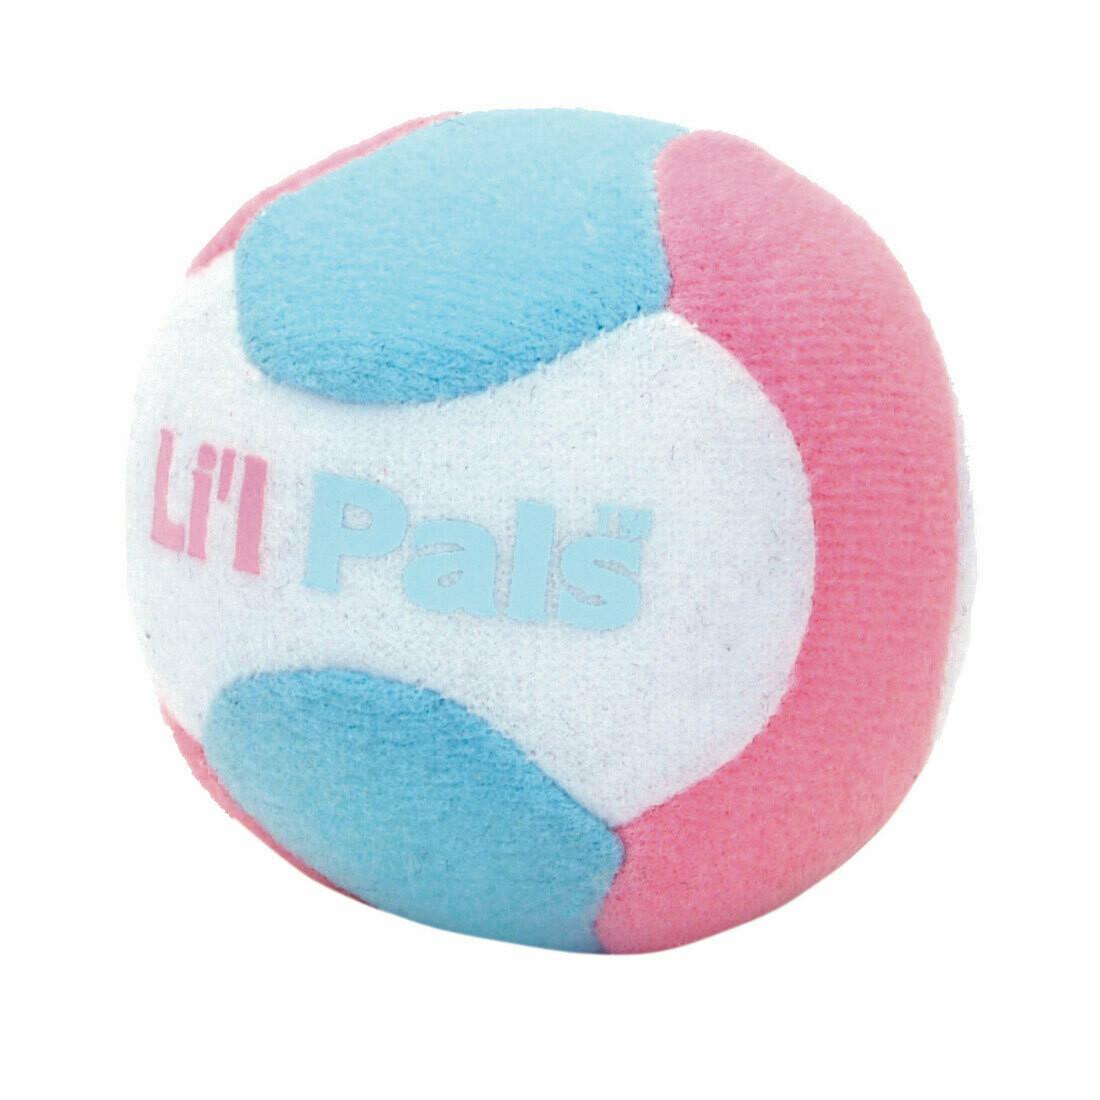 "LIL PALS PLUSH BALL 2""."